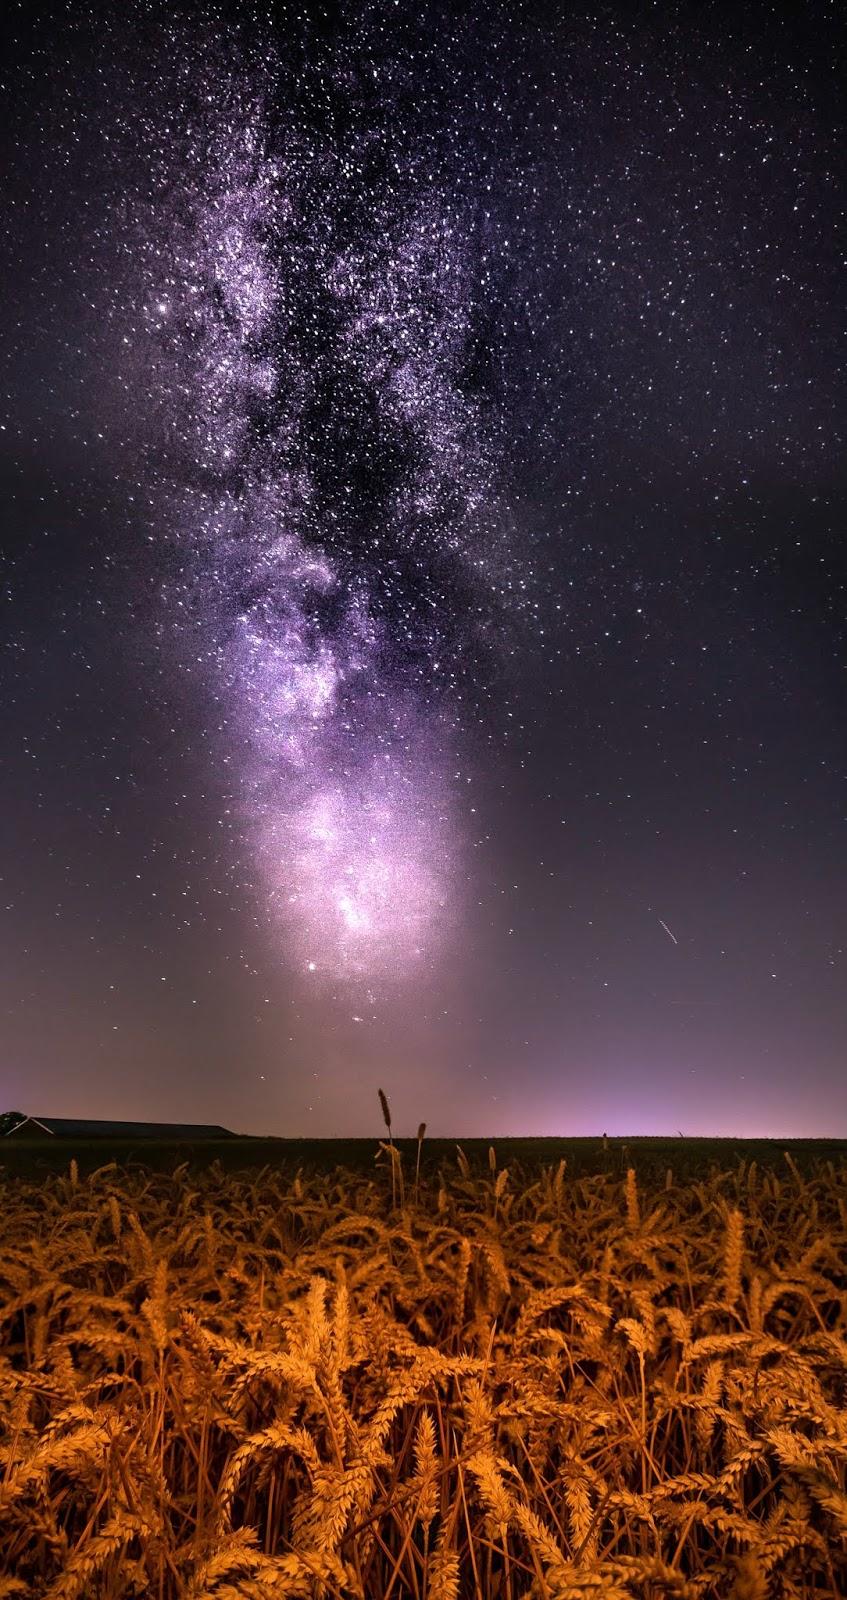 Milky way under the night